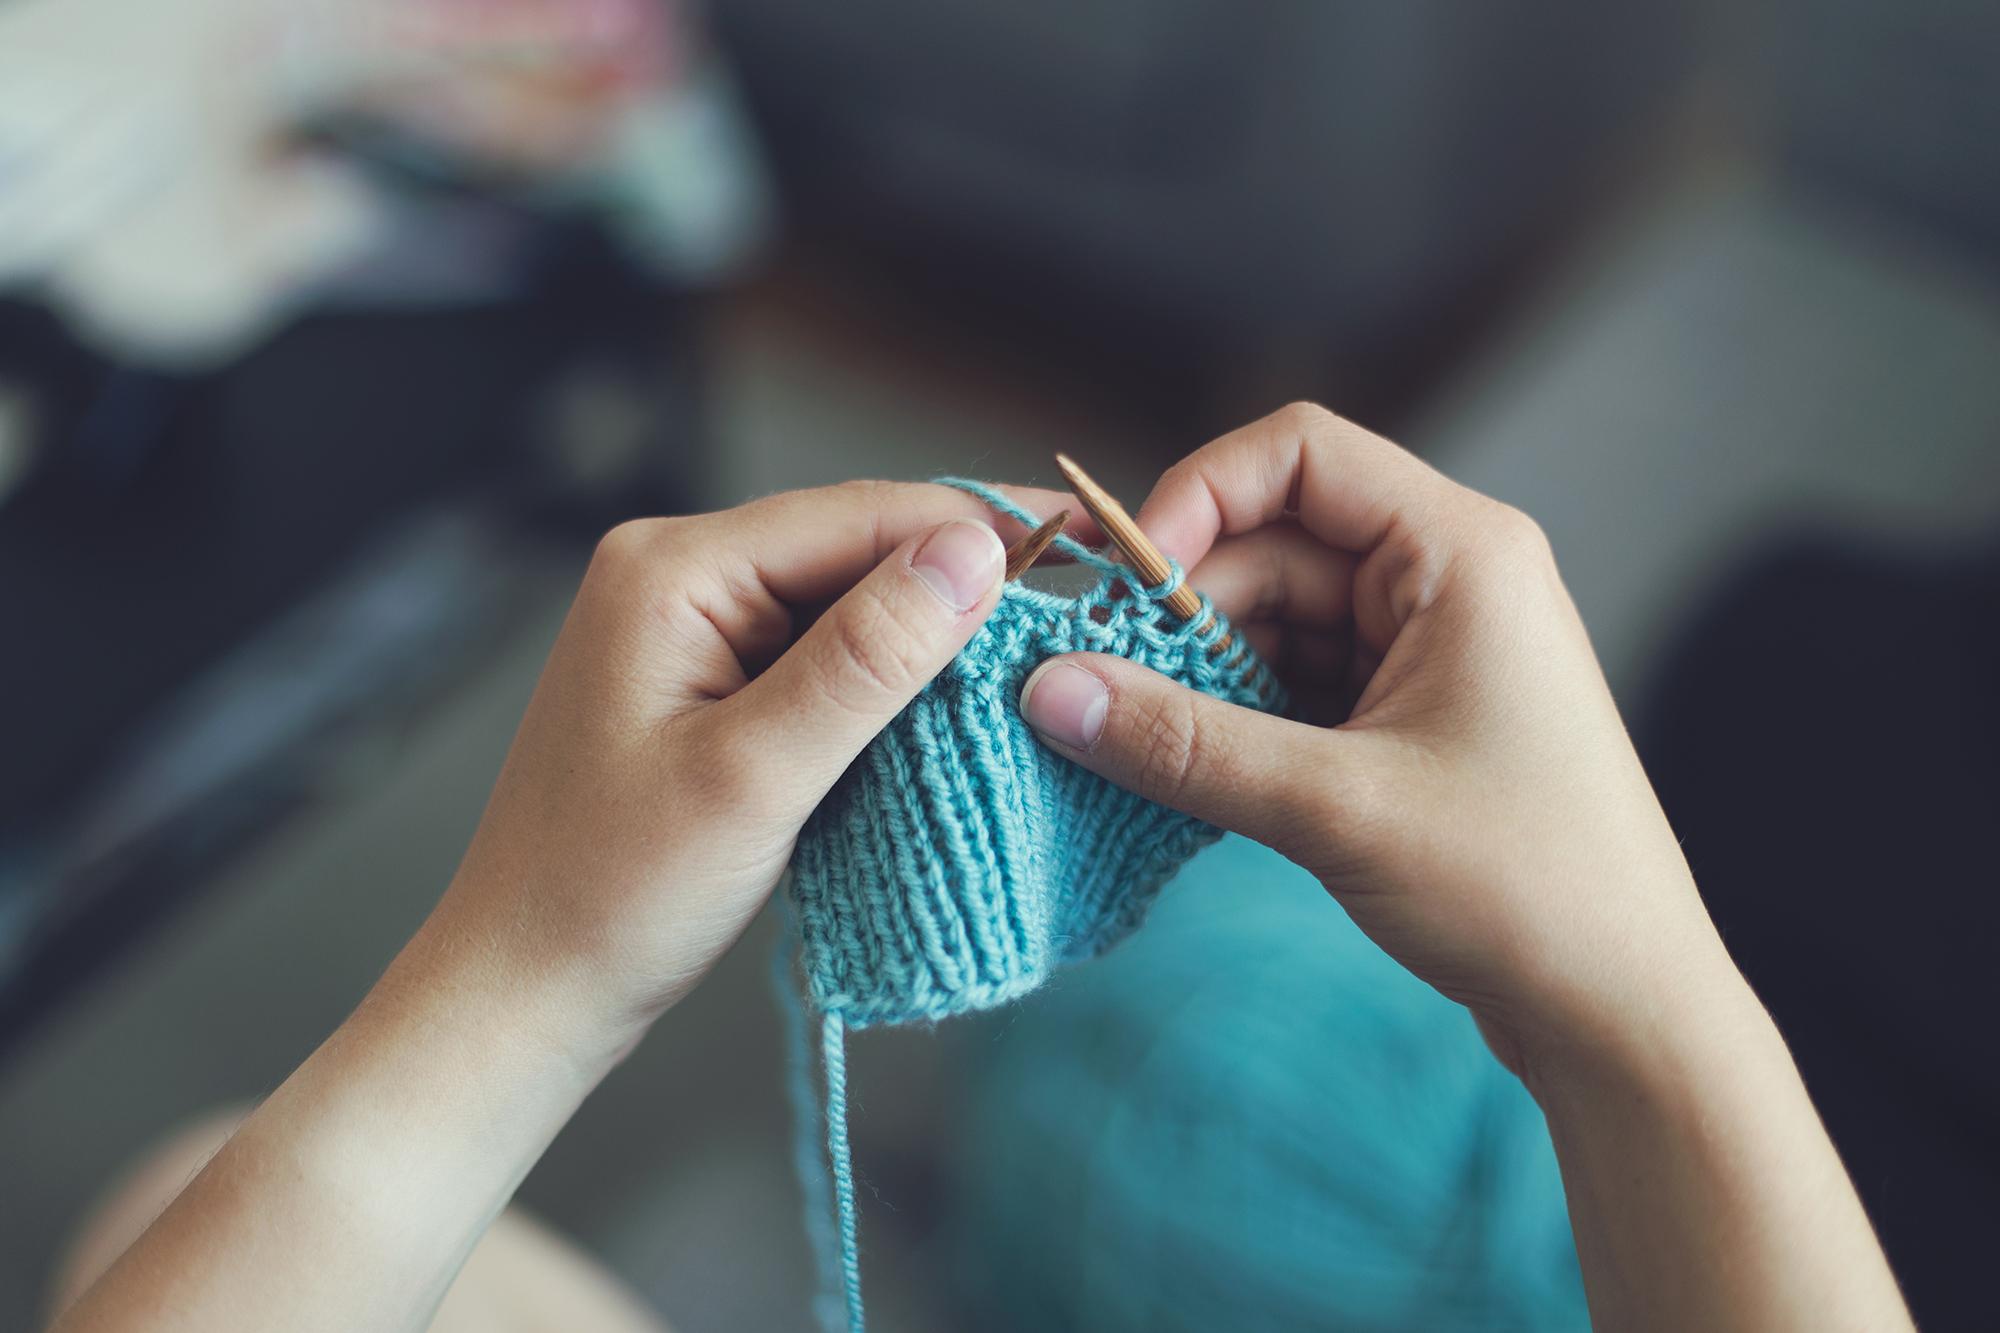 knit-869221